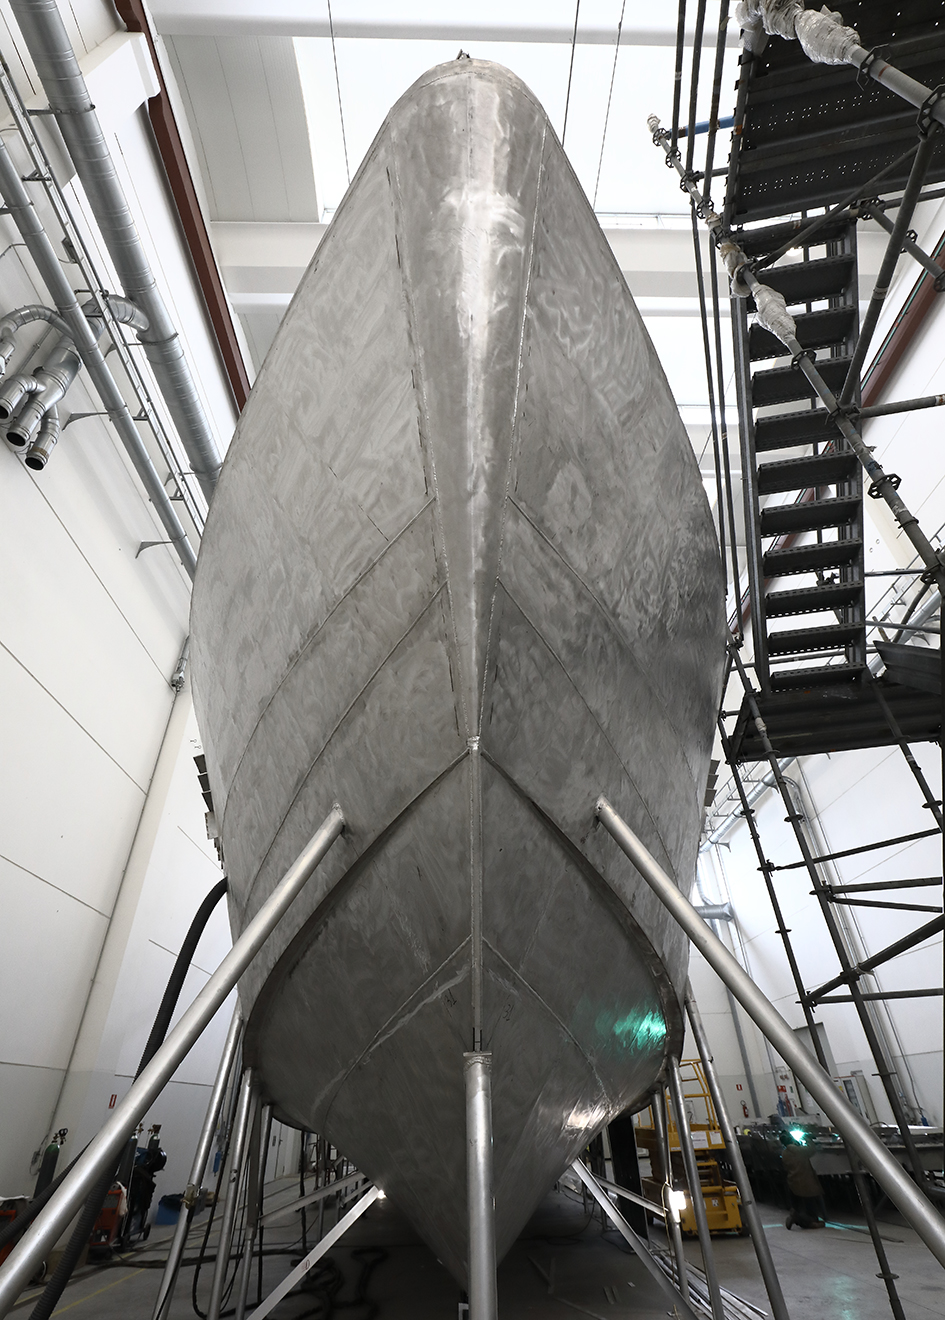 bow-view-of-the-perini-navi-eco-tender